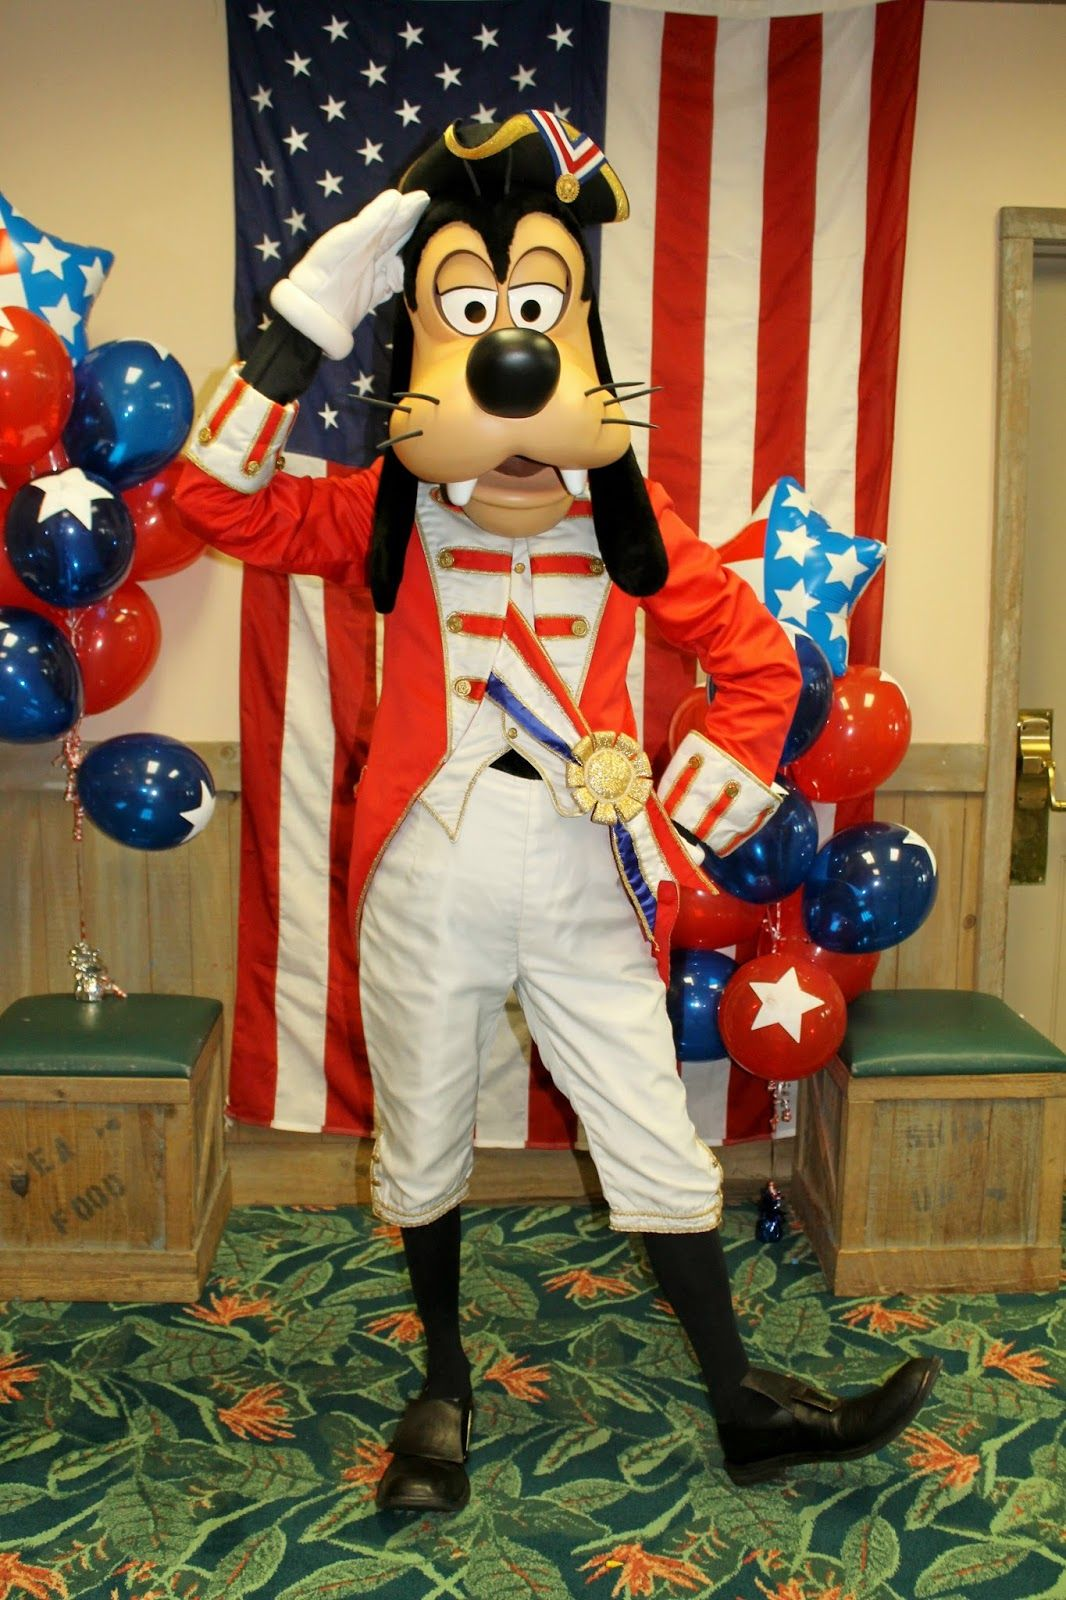 Goofy+OKW.jpg 1,066×1,600 ピクセル Disney holiday, Disney